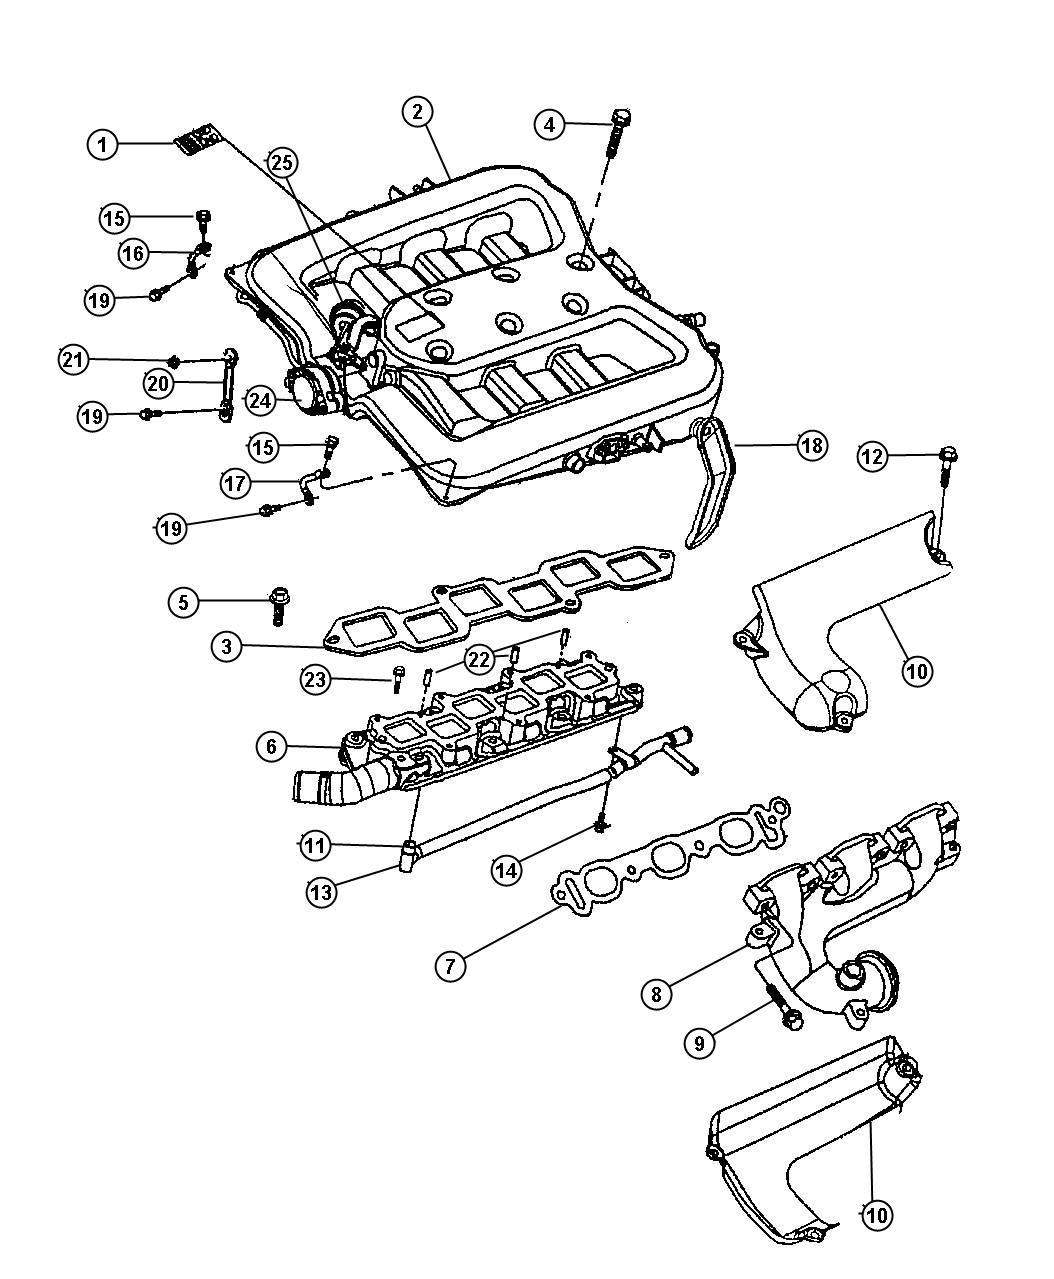 2002 dodge ram exterior parts diagram html